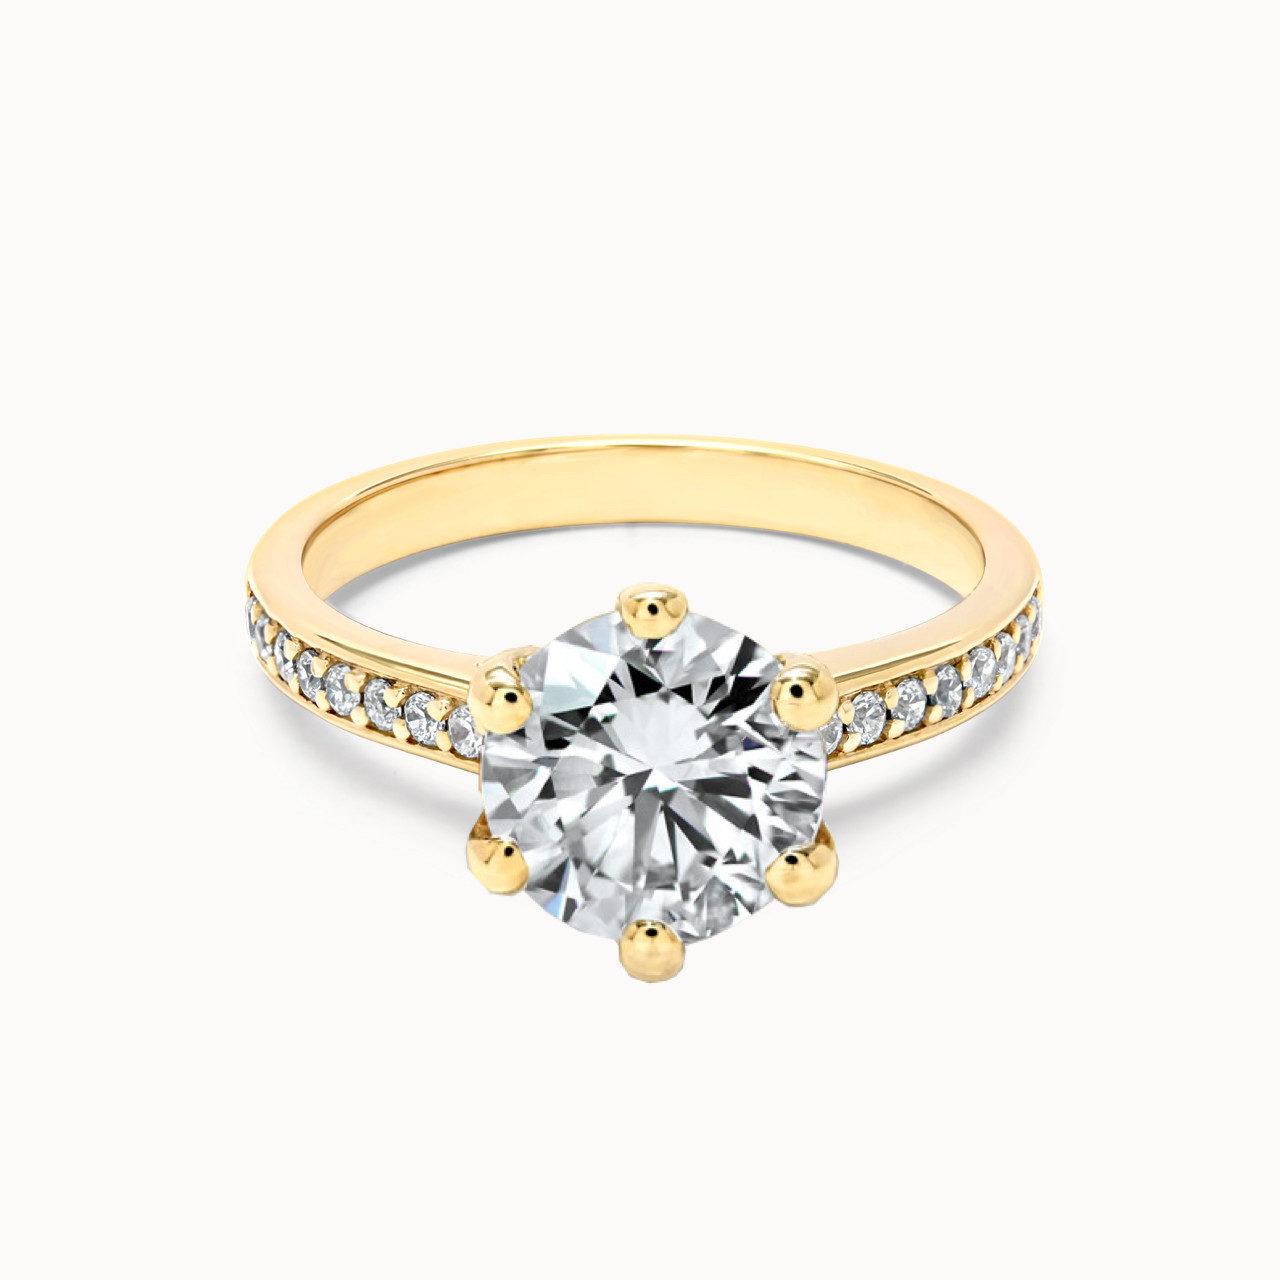 Pavee Ring aus Gelbgold mit 1.5 Karat Diamant